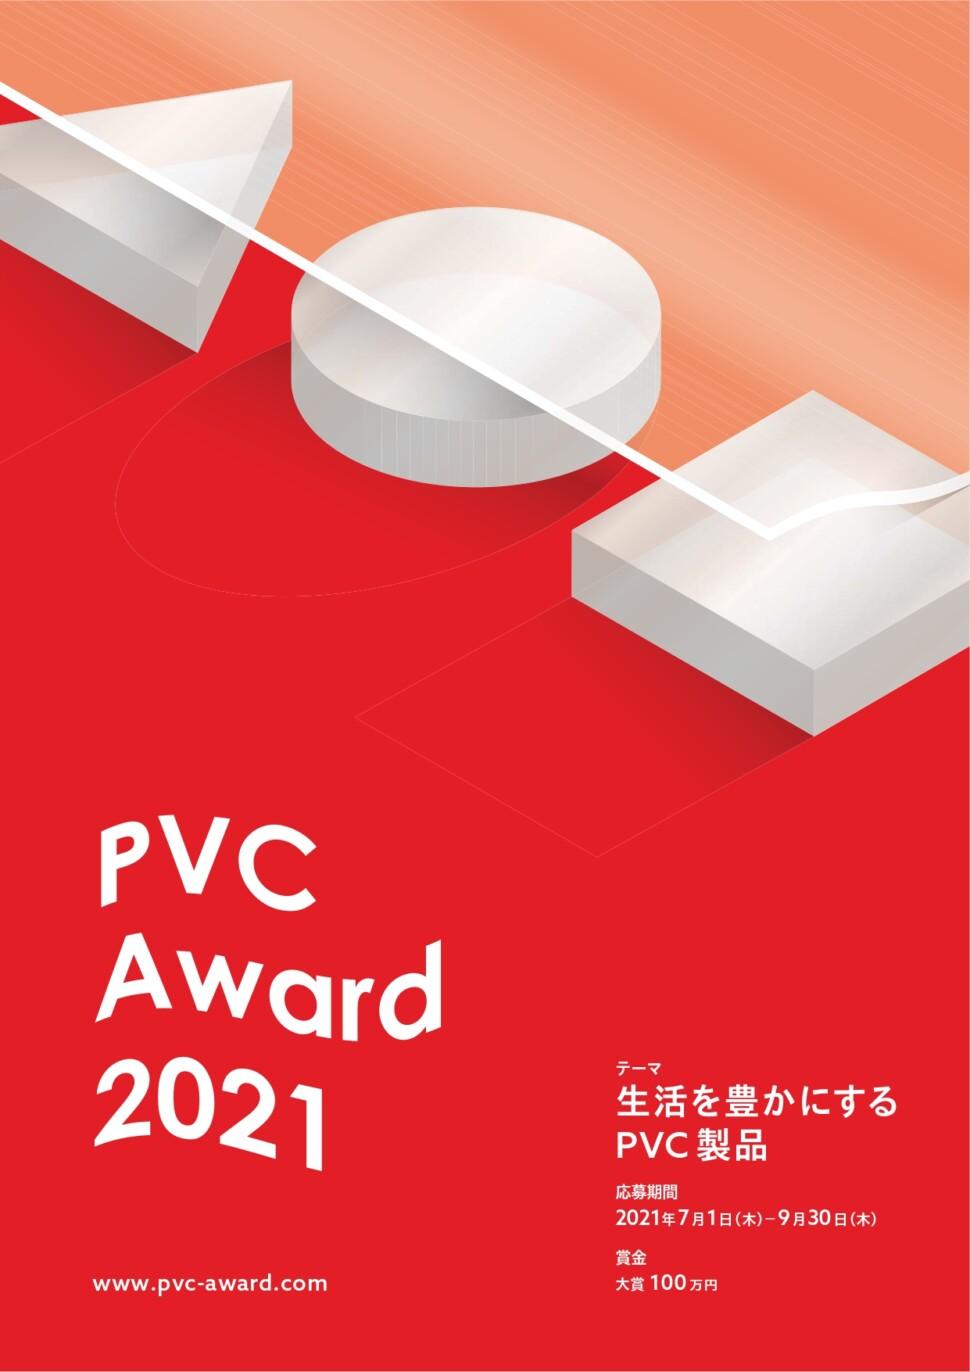 PVCaward_